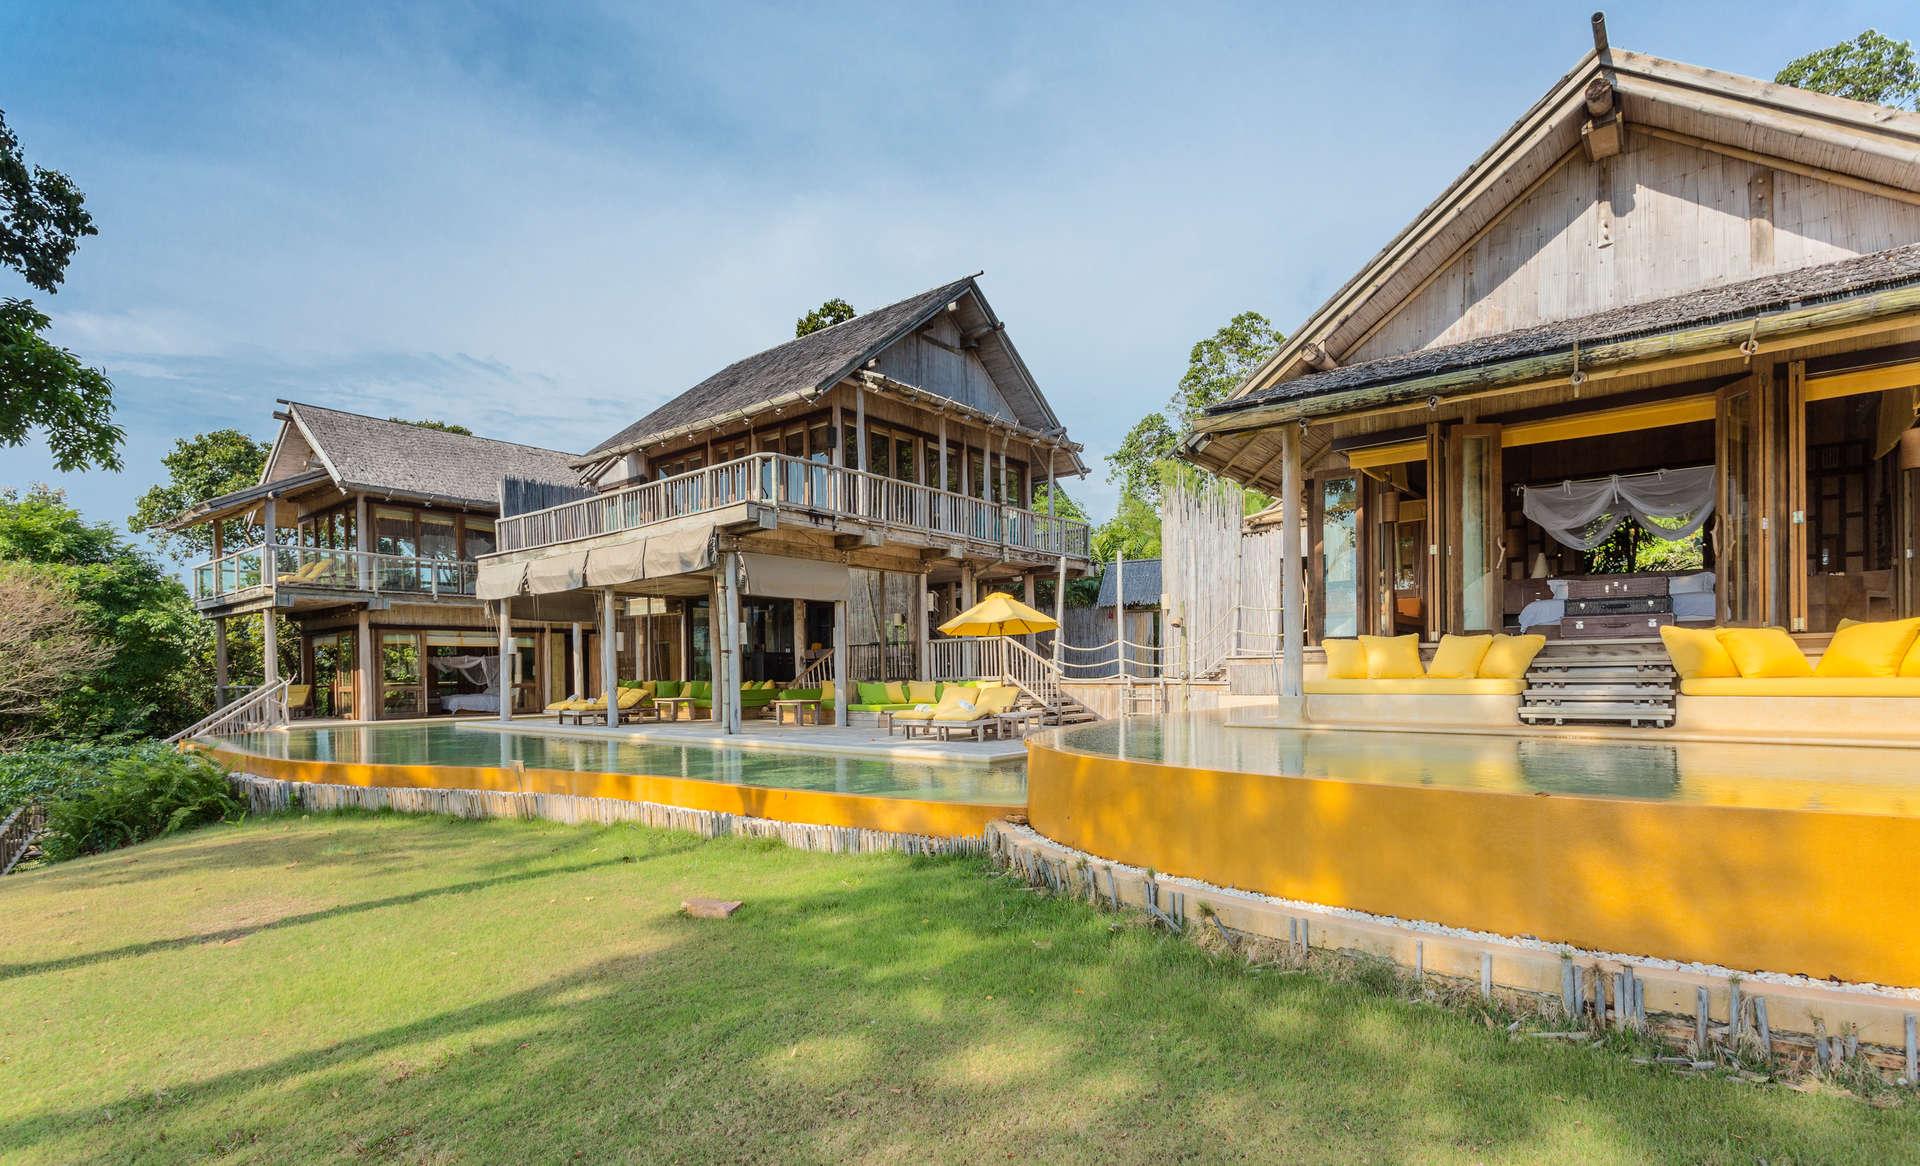 Luxury villa rentals asia - Thailand - Ko kut - Soneva kiri resort - Sunset Ocean View Pool Reserve | 5 BDMS - Image 1/27